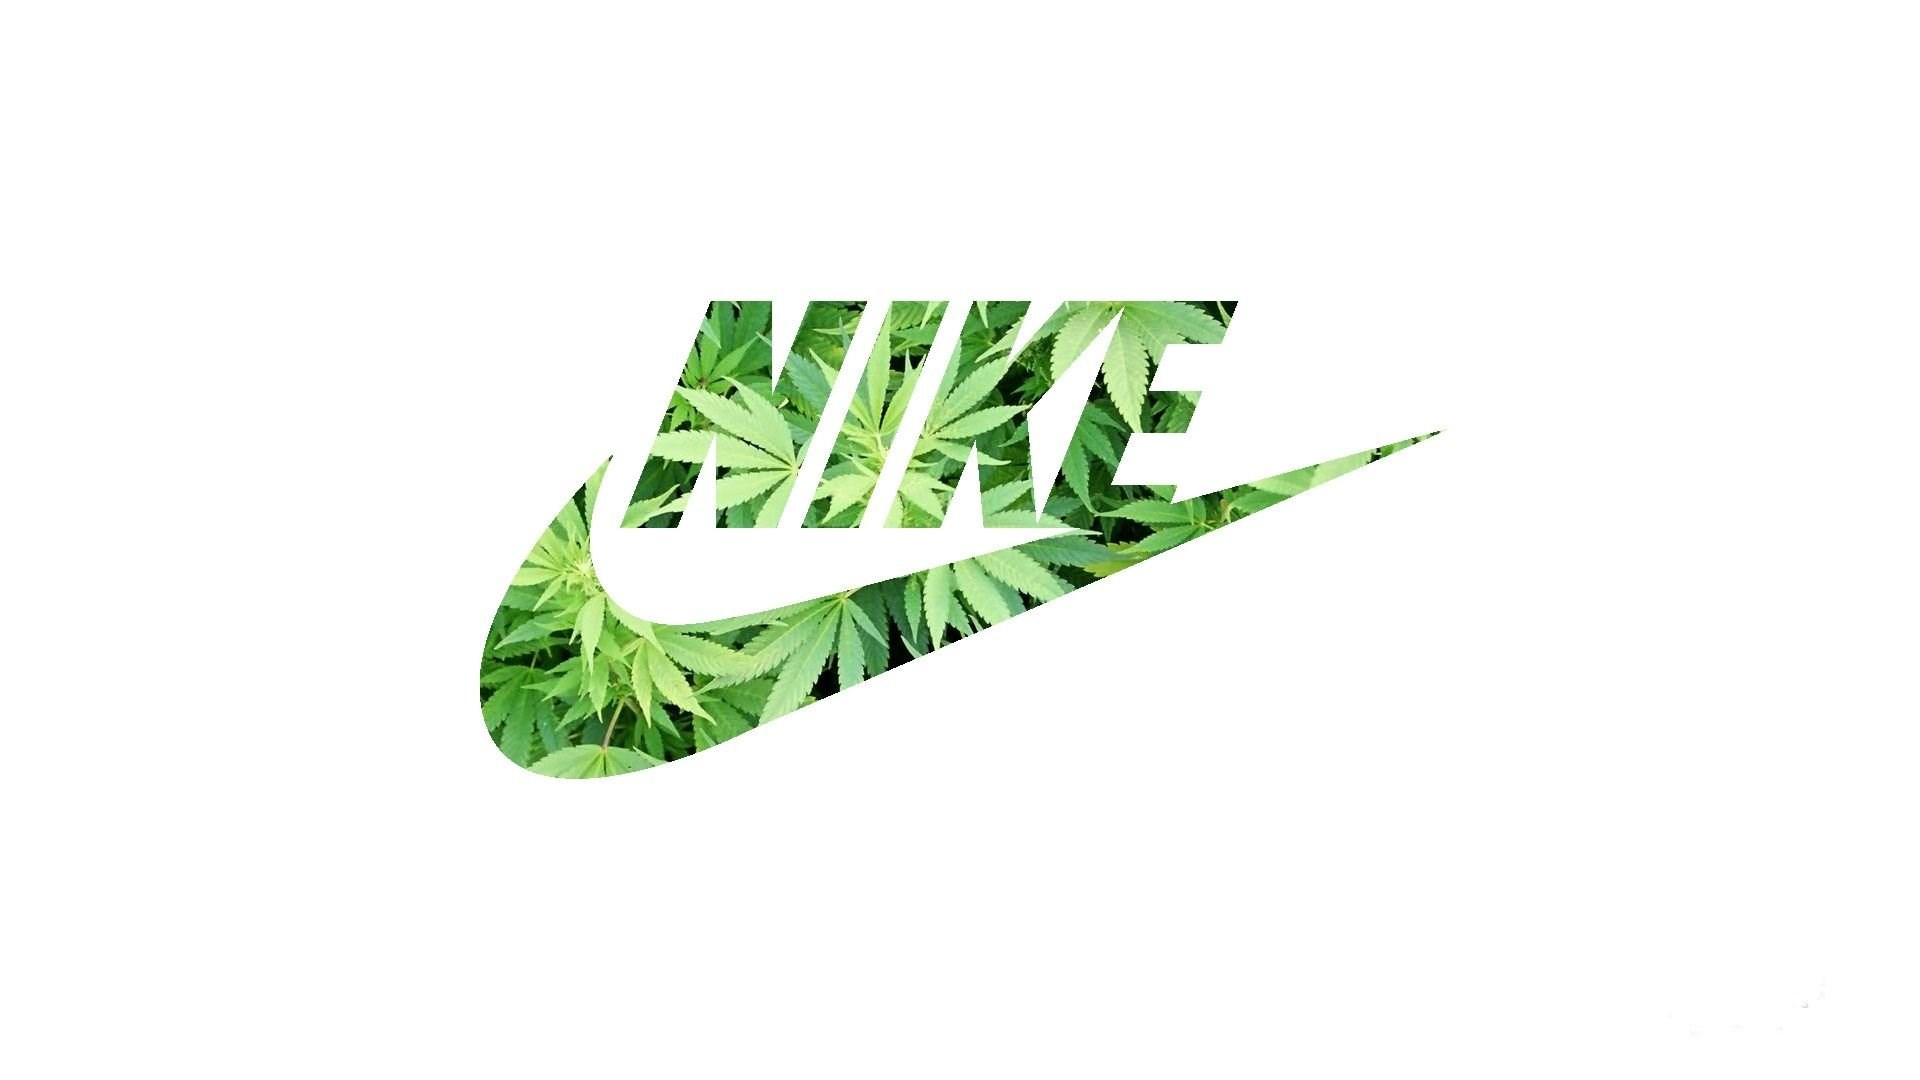 Nike Wallpapers Tumblr Wallpapers Widescreen Desktop Background